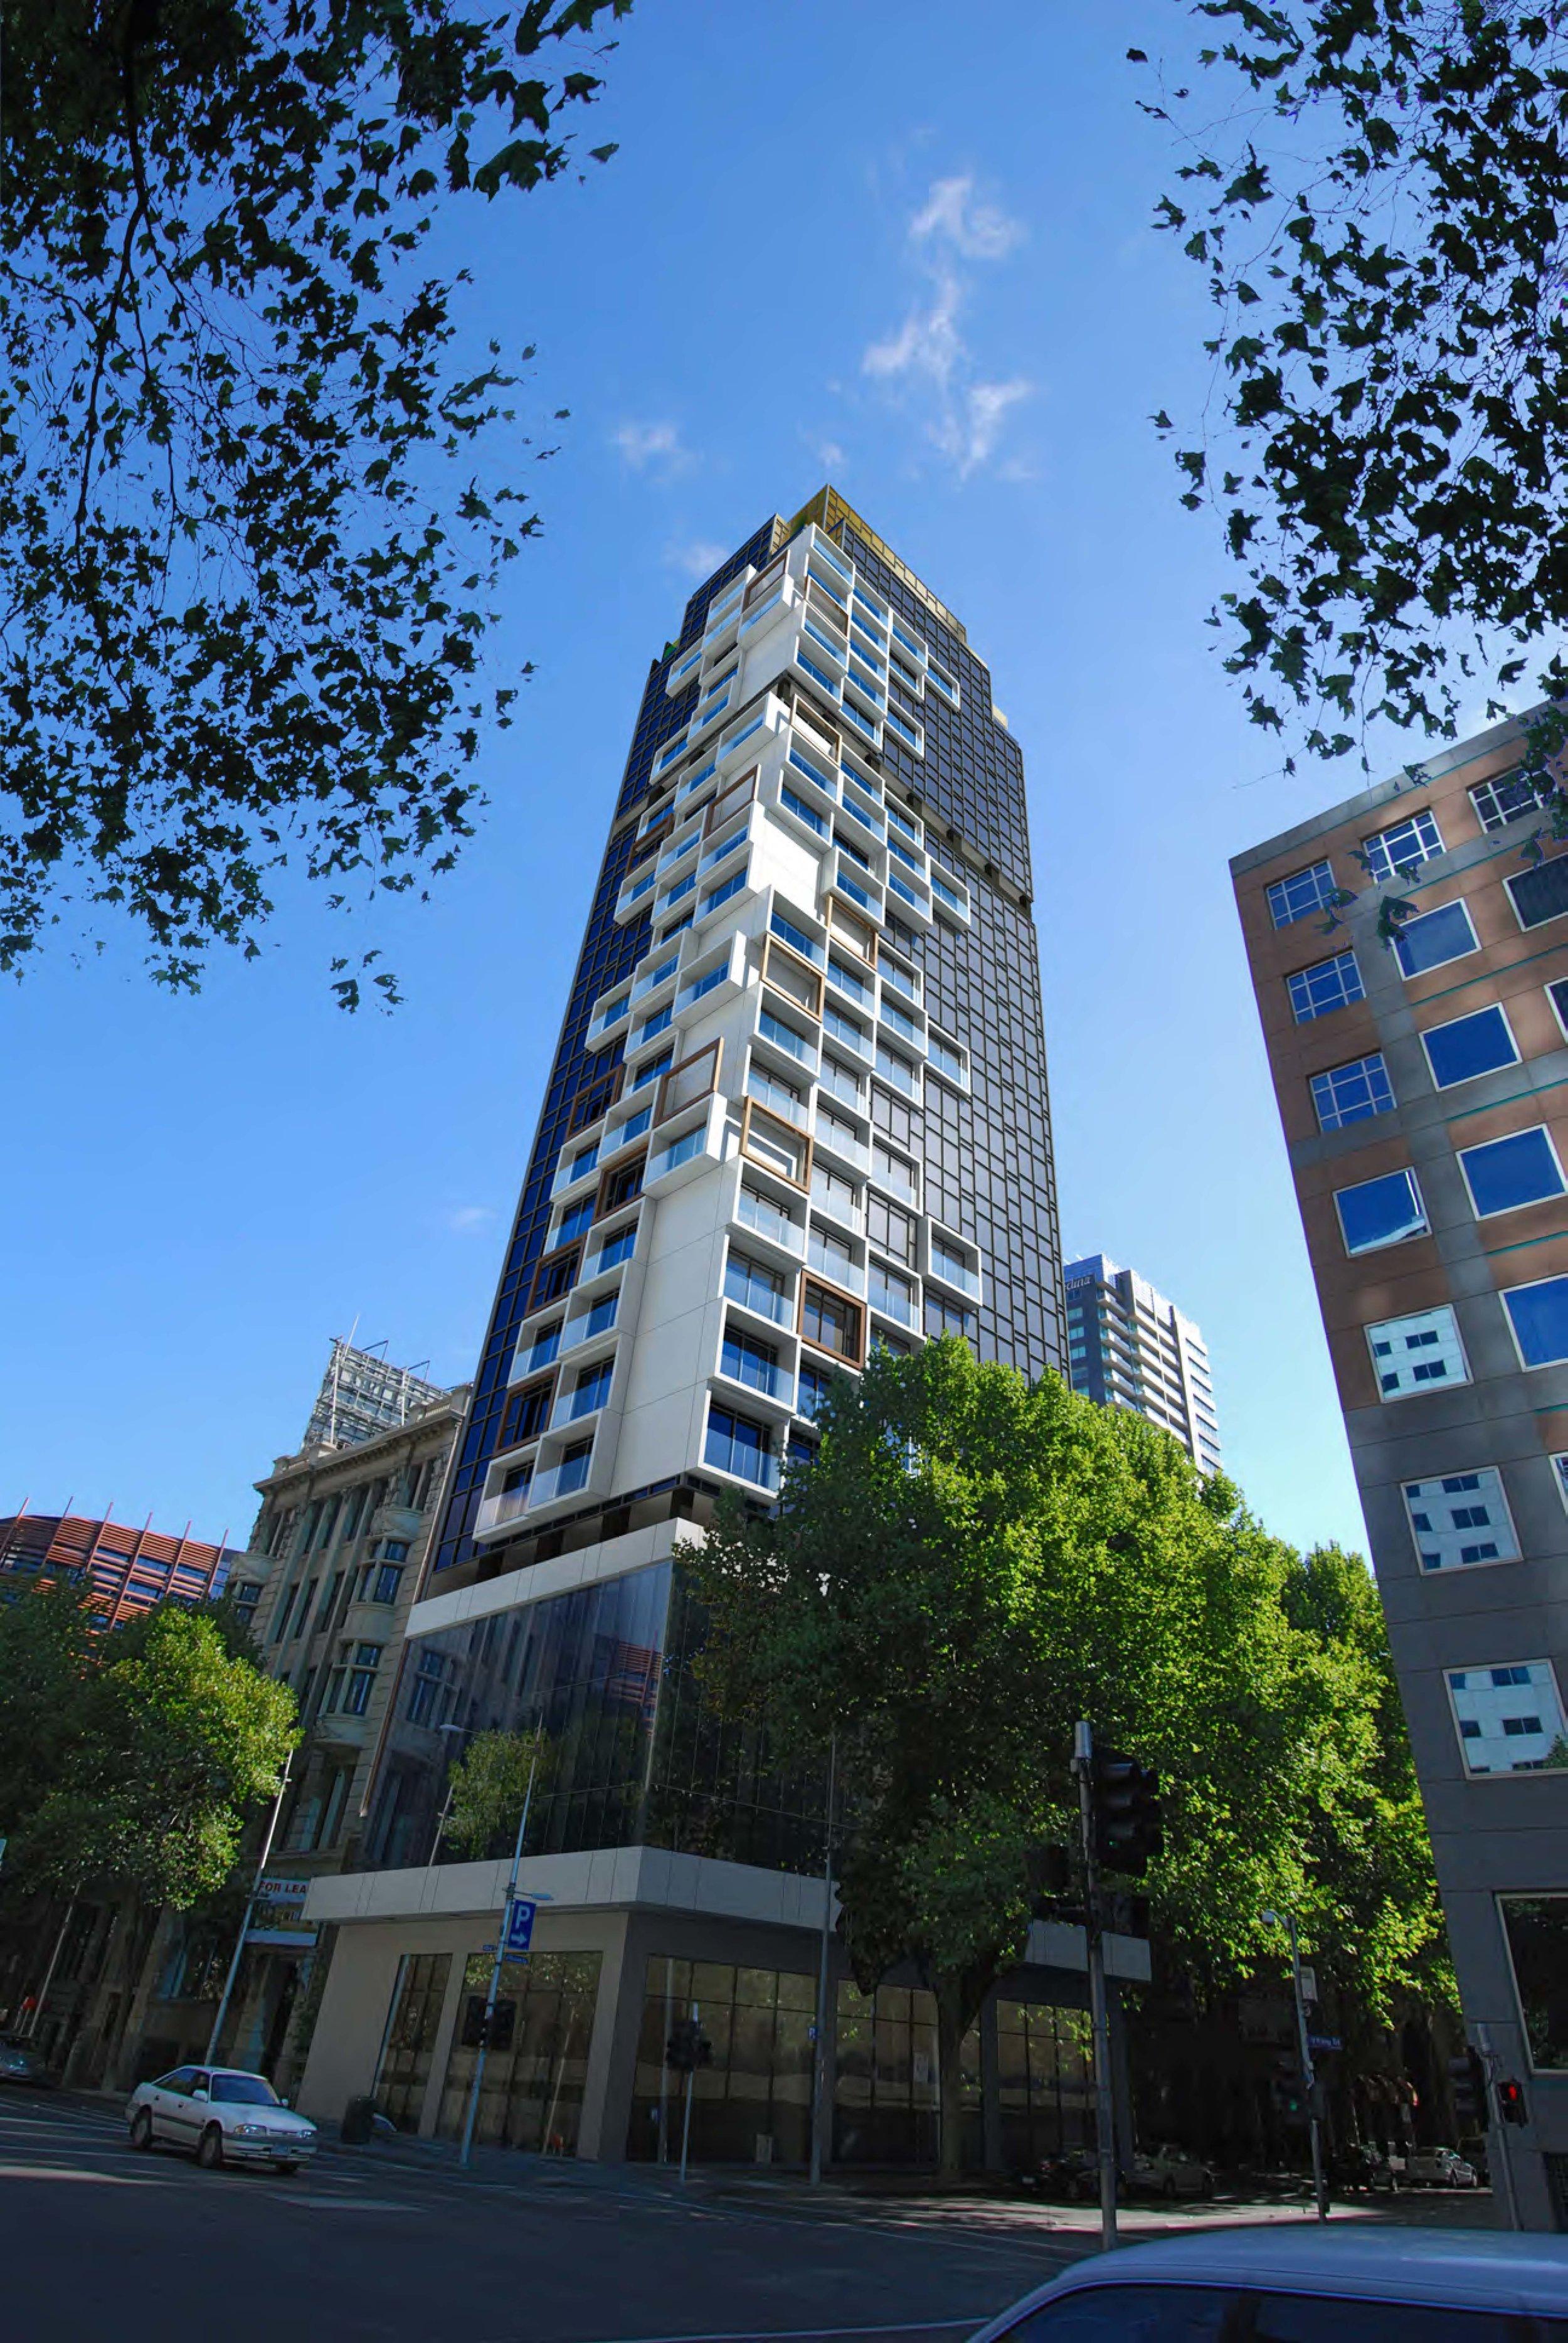 Residential, Melbourne